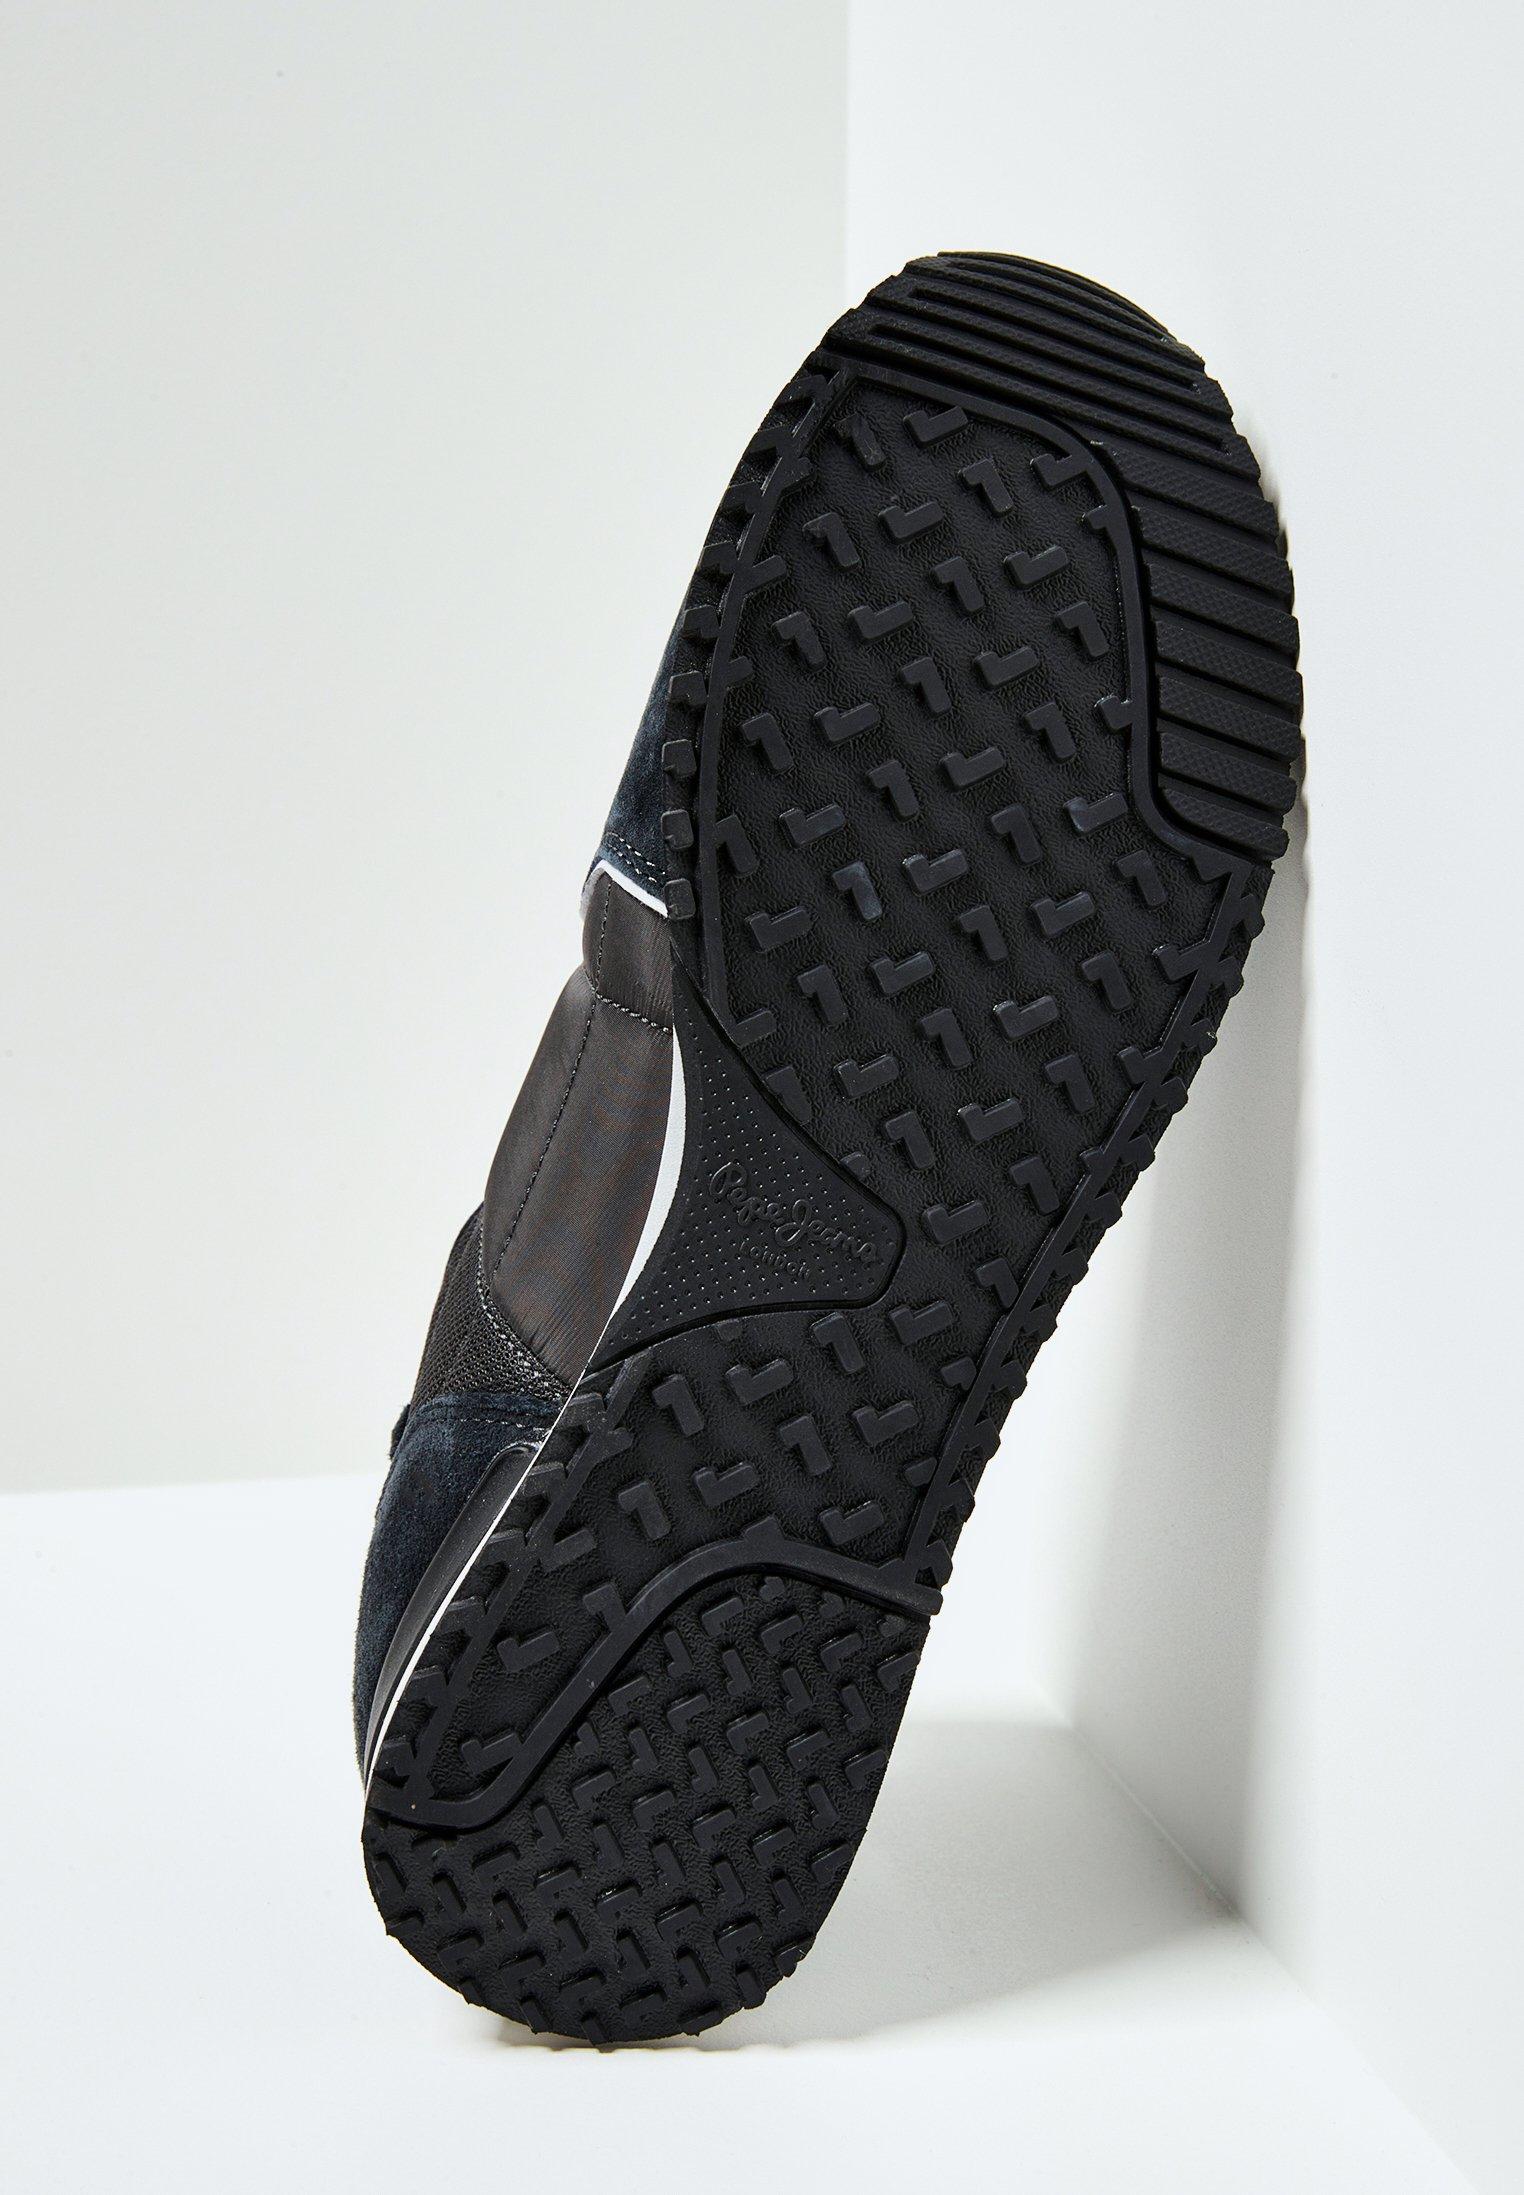 Pepe Jeans TINKER CITY - Snörskor - anthracite/mörkgrå - Herrskor w7er4